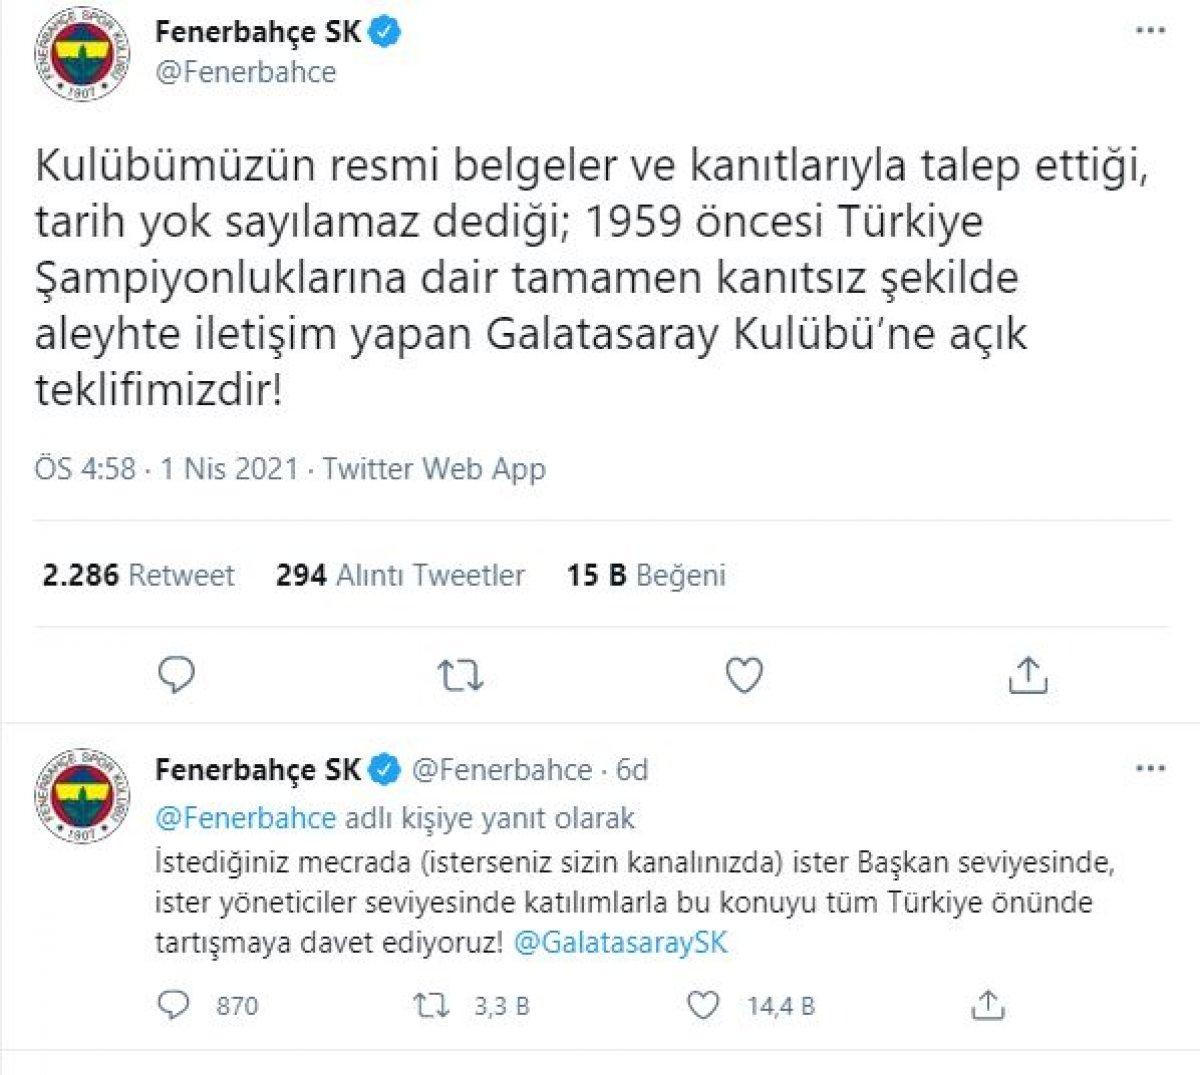 Fenerbahçe den Galatasaray a: İsterseniz GS TV de tartışalım #2